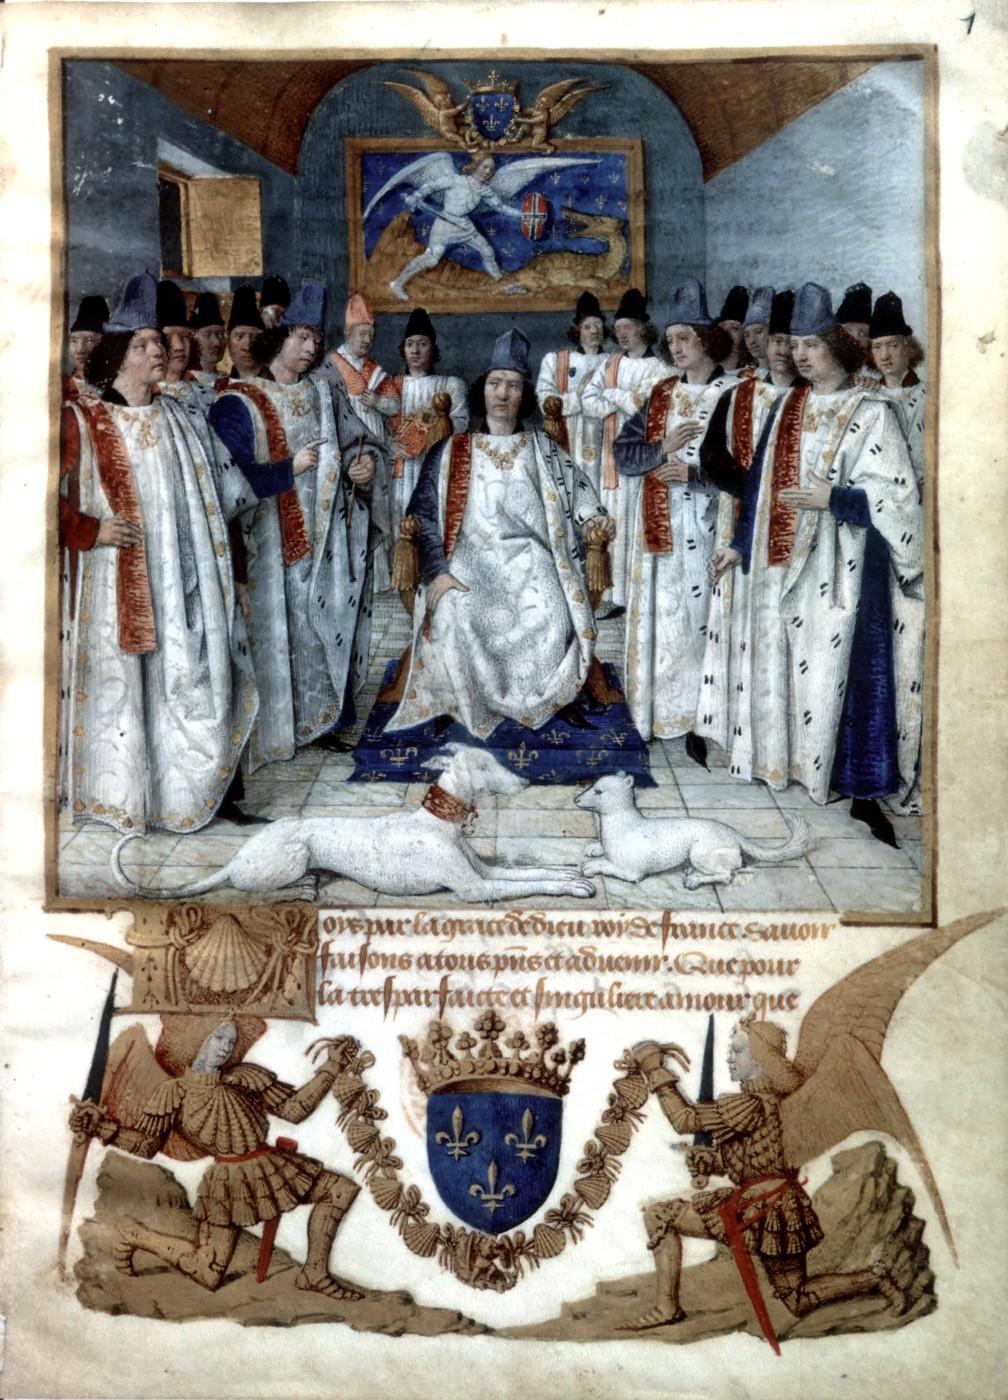 Louis de XI., rechts sein Bruder Charles und Antoine de Chabannes mit dem Stab des Grand maître, von Jean Fouquet, Public Domain